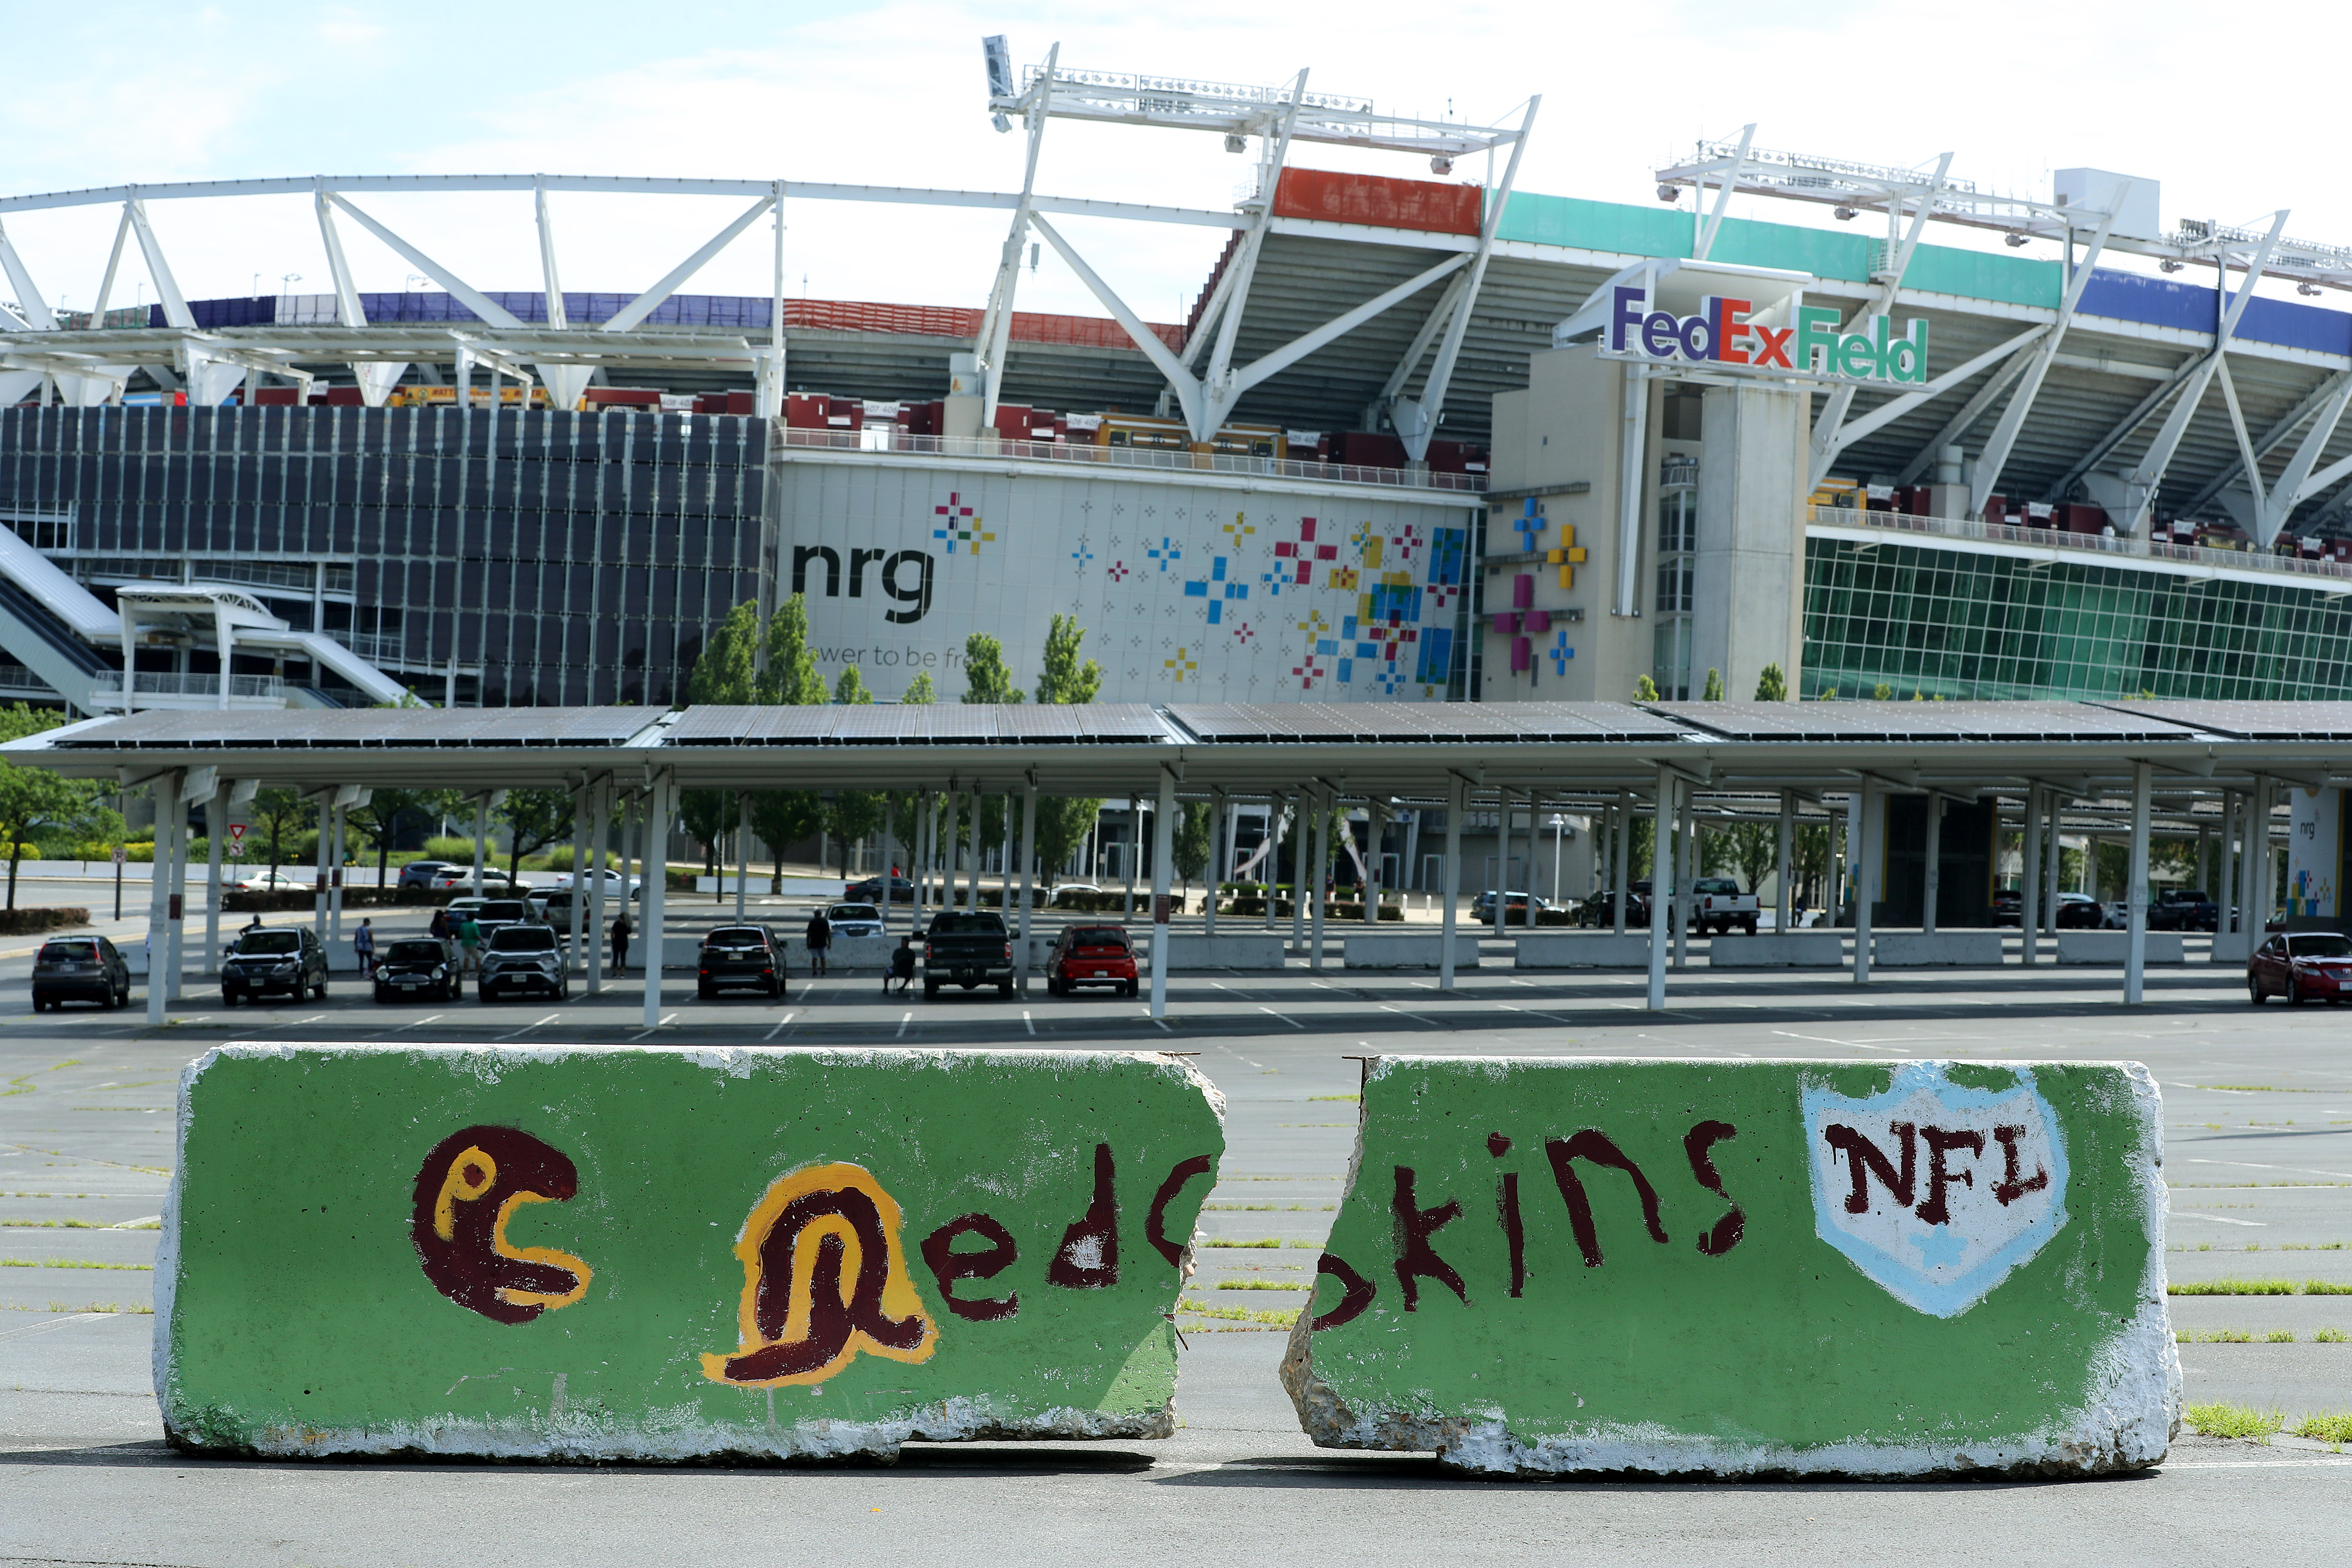 NFL Franchise Washington Redskins To Change Team Name After 87 Years